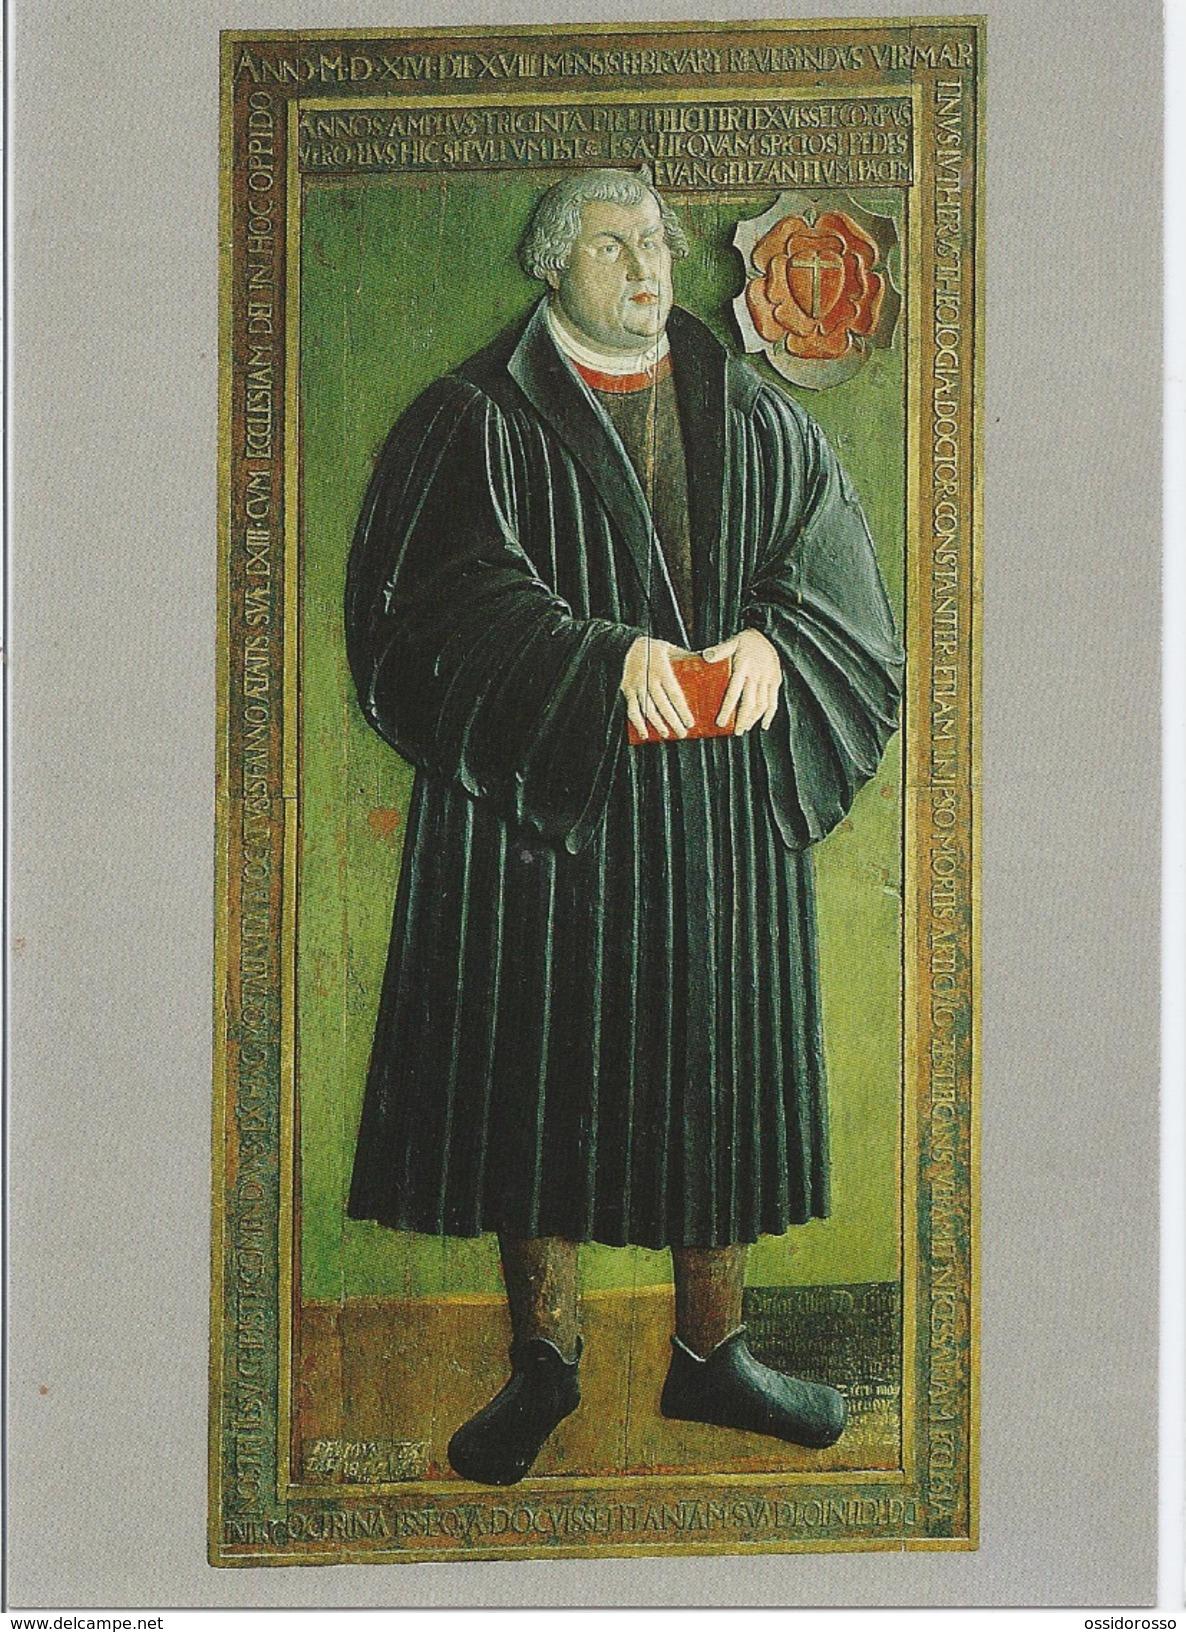 Modell Der Grabplatte Martin Luthers - -Model Of Martin Luther's Grave - Andreaskirche Erfurt - Erfurt